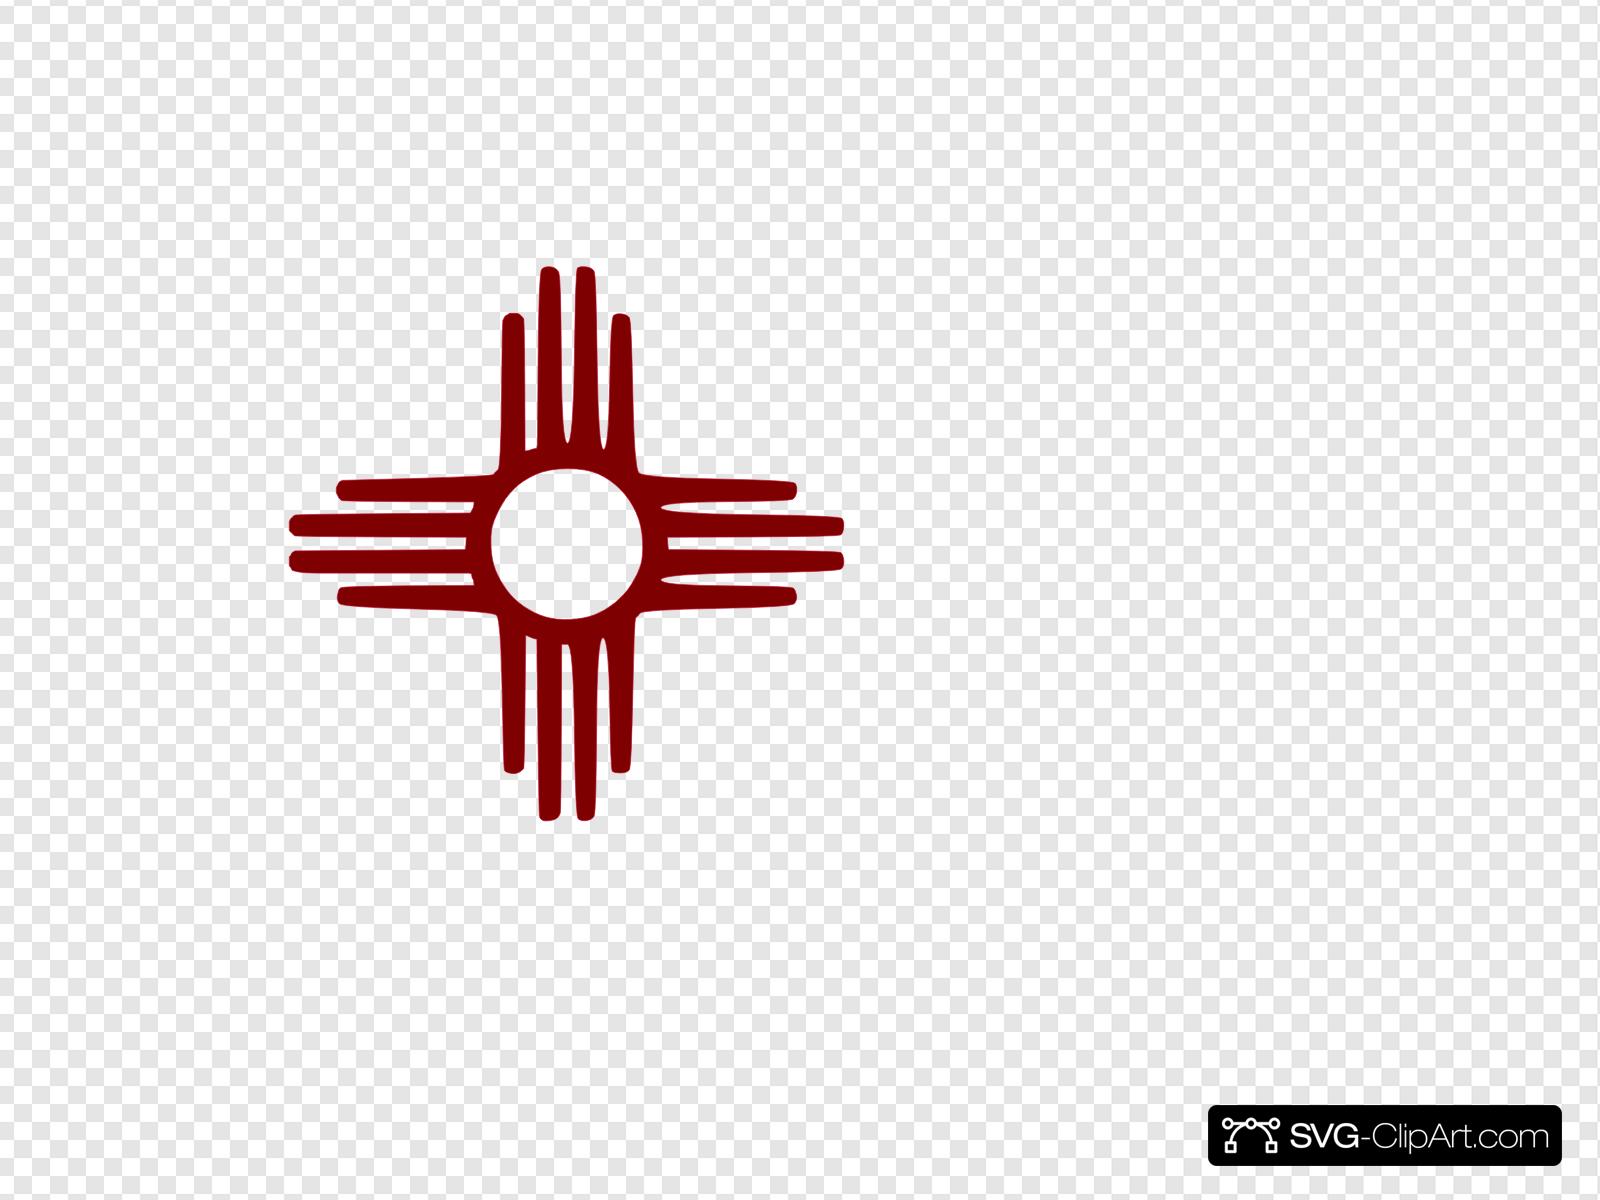 Zia Symbol Maroon Clip art, Icon and SVG.